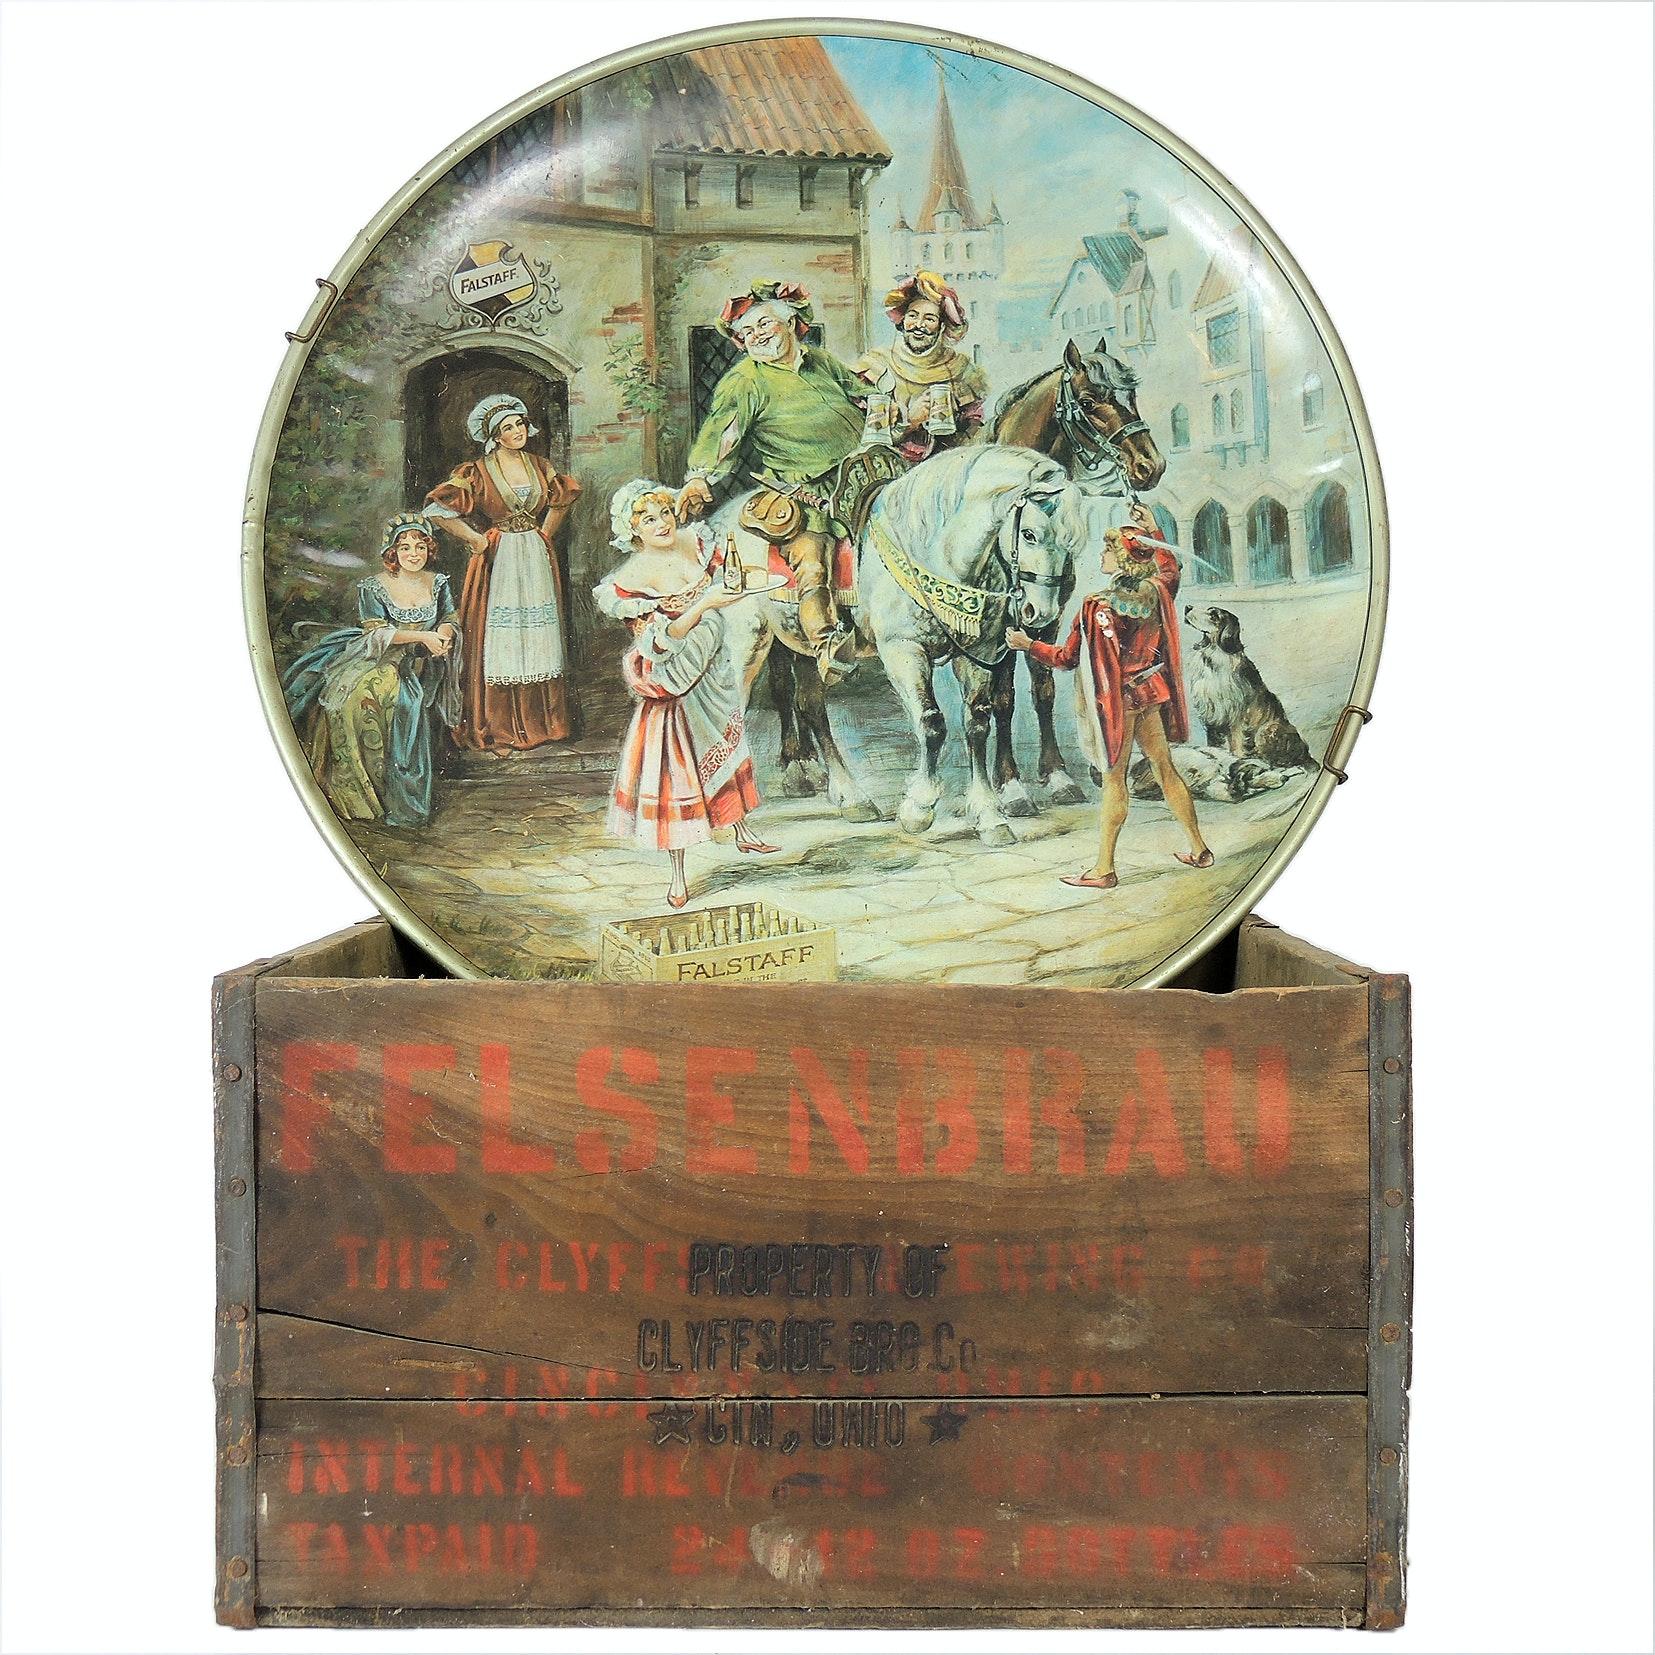 Felsenbrau of Cincinnati Vintage Beer Crate and Falstaff Reproduction Plate